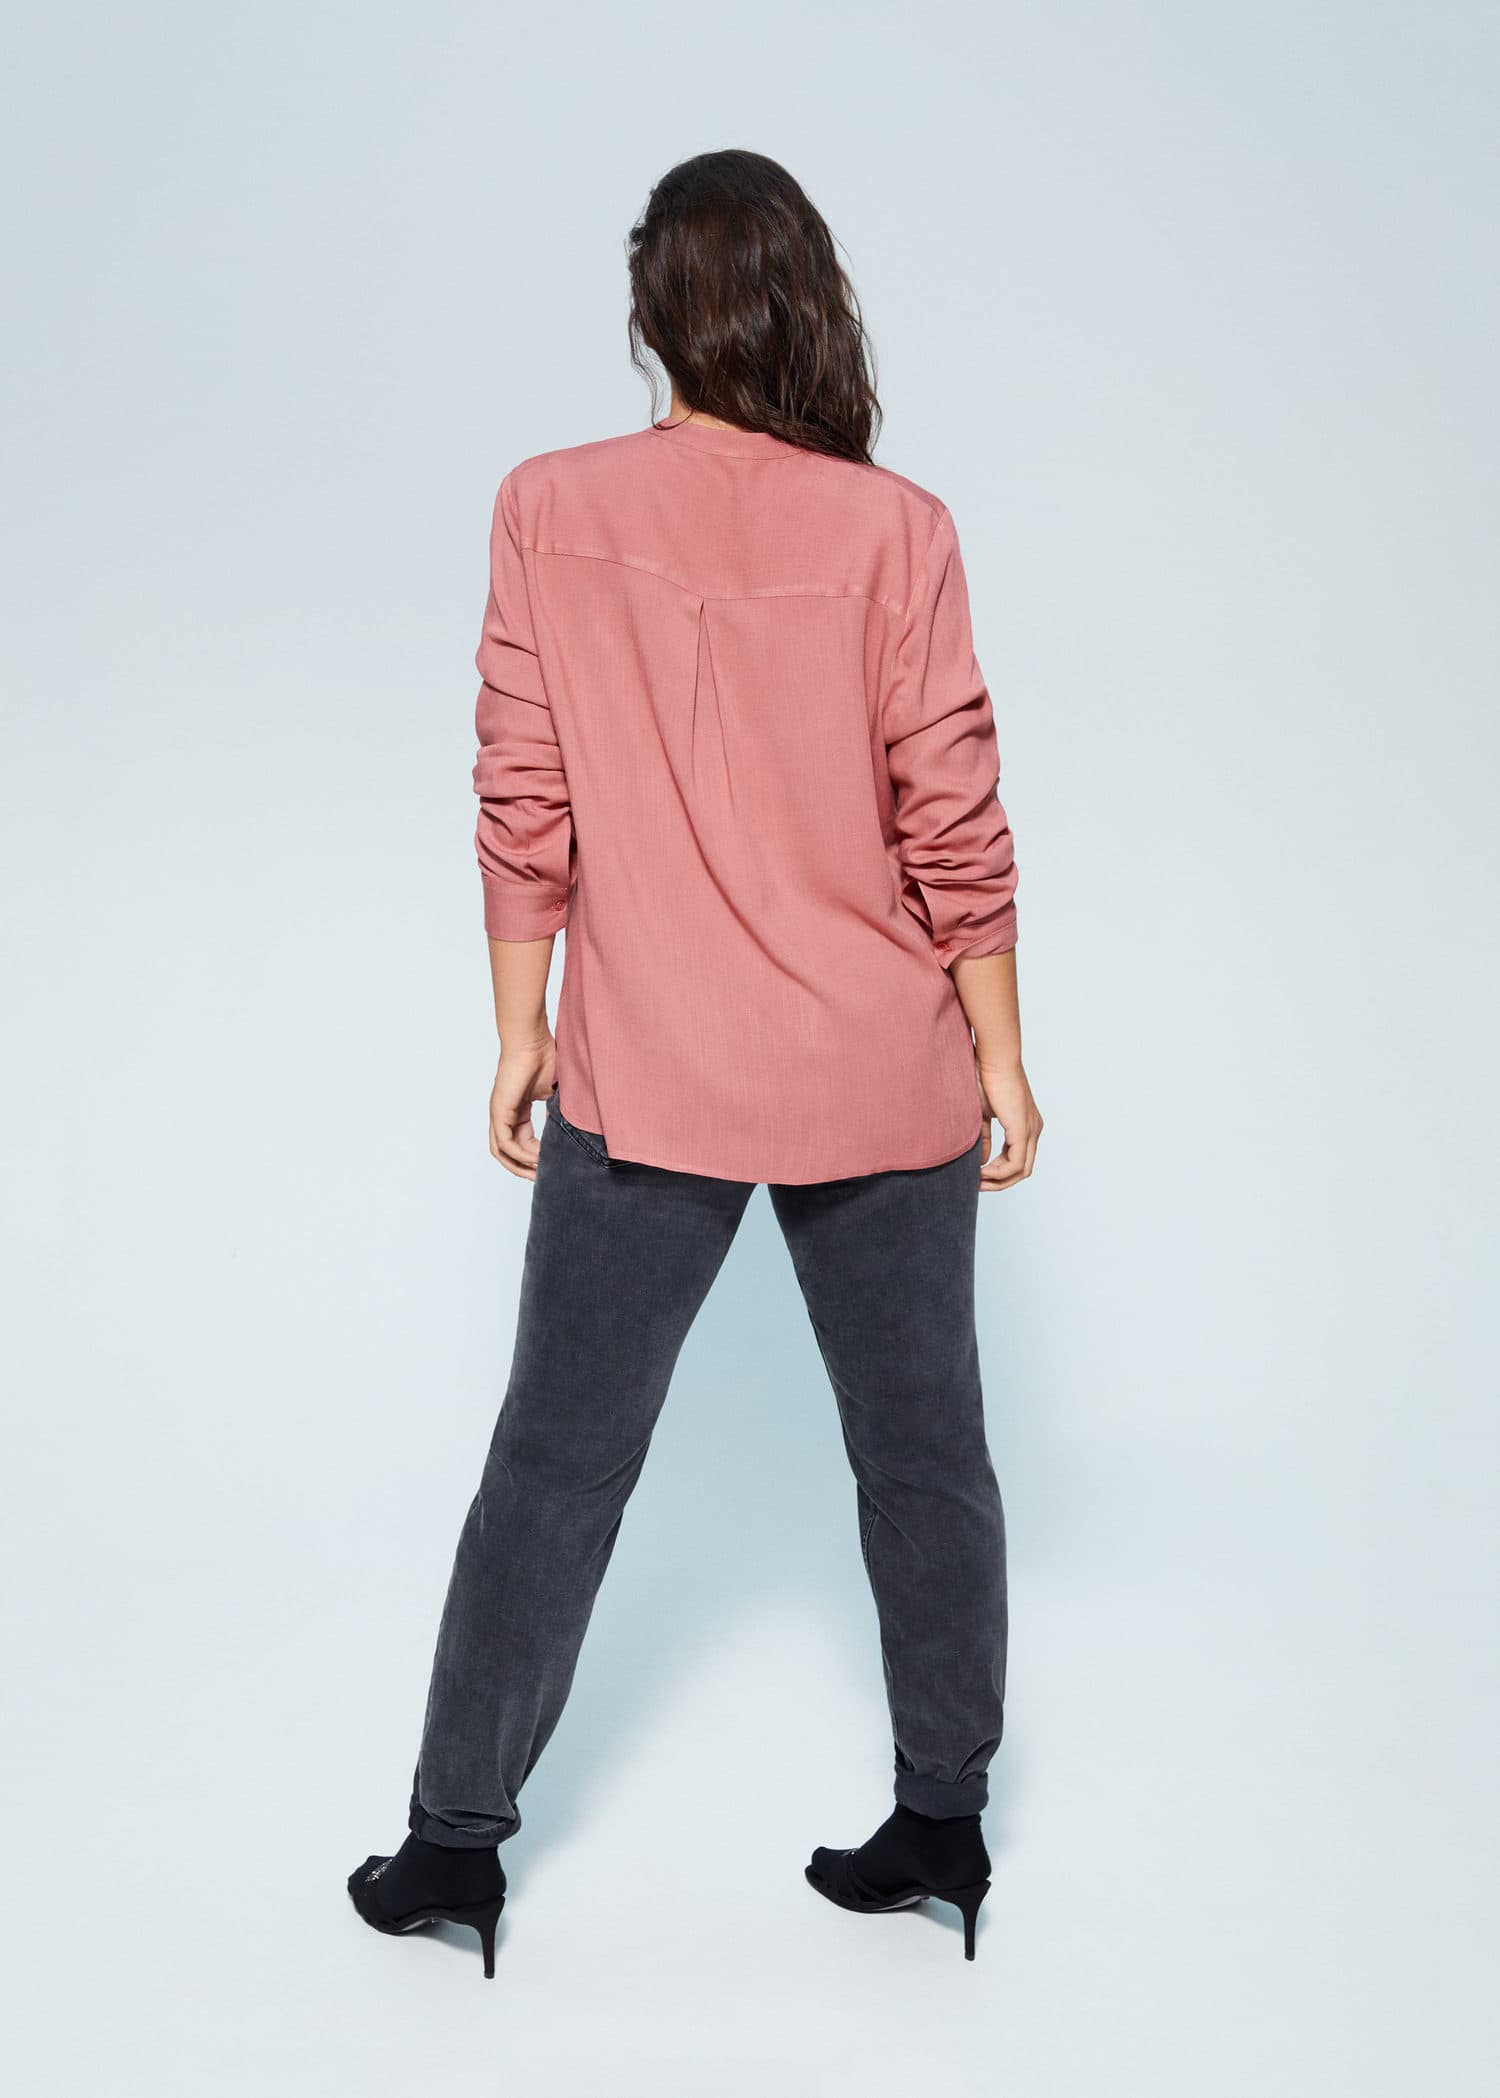 Camisas Tallas grandes 2019   Violeta by Mango USA